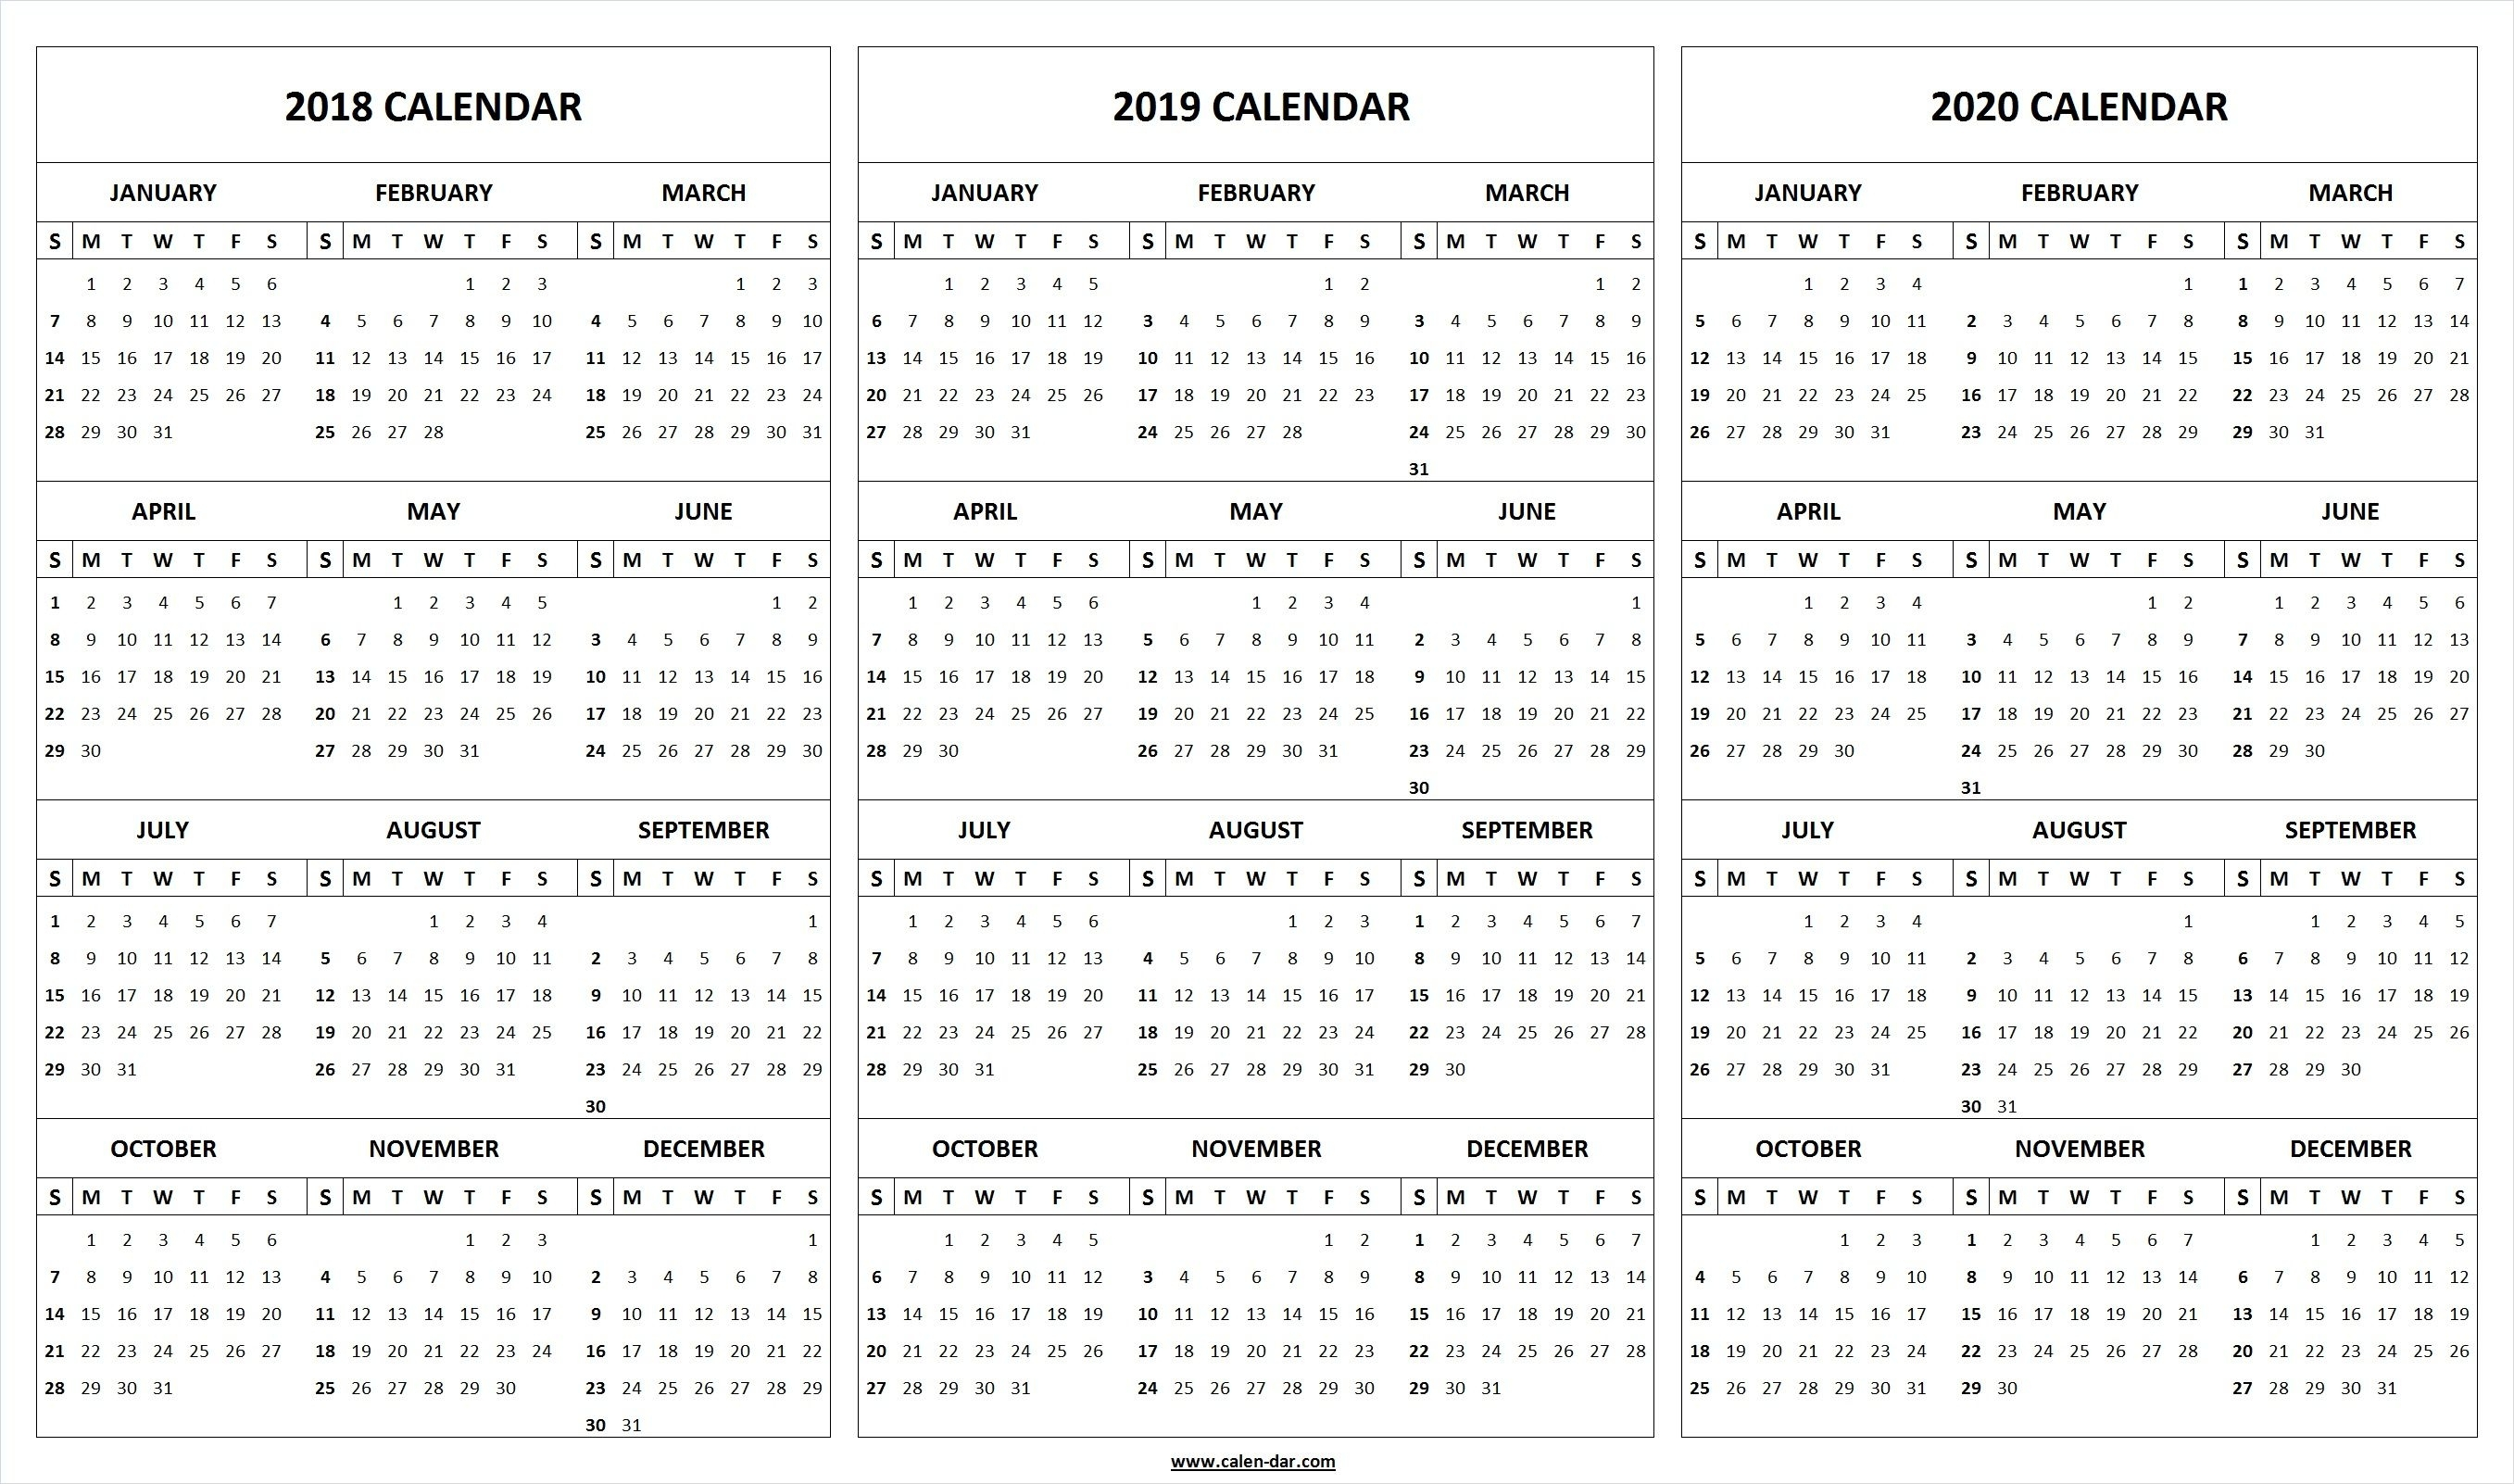 Print Blank 2018 2019 2020 Calendar Template   Organize!   Printable regarding 2019 And 2020 Calendar One Page